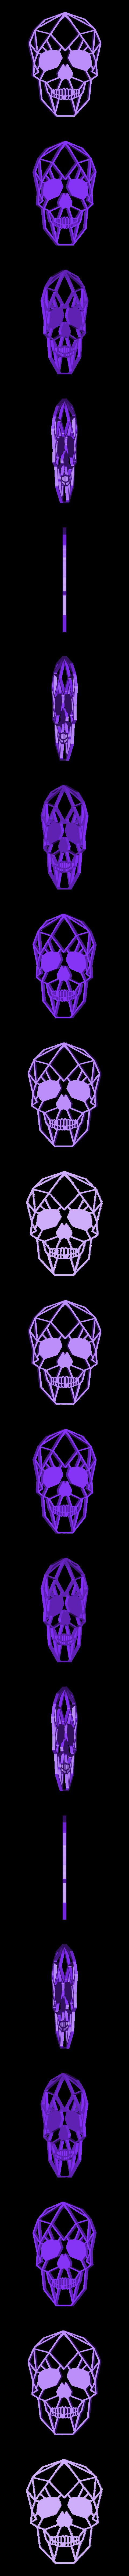 11.skull.stl Download STL file Skull Wall Sculpture 2D • Model to 3D print, UnpredictableLab